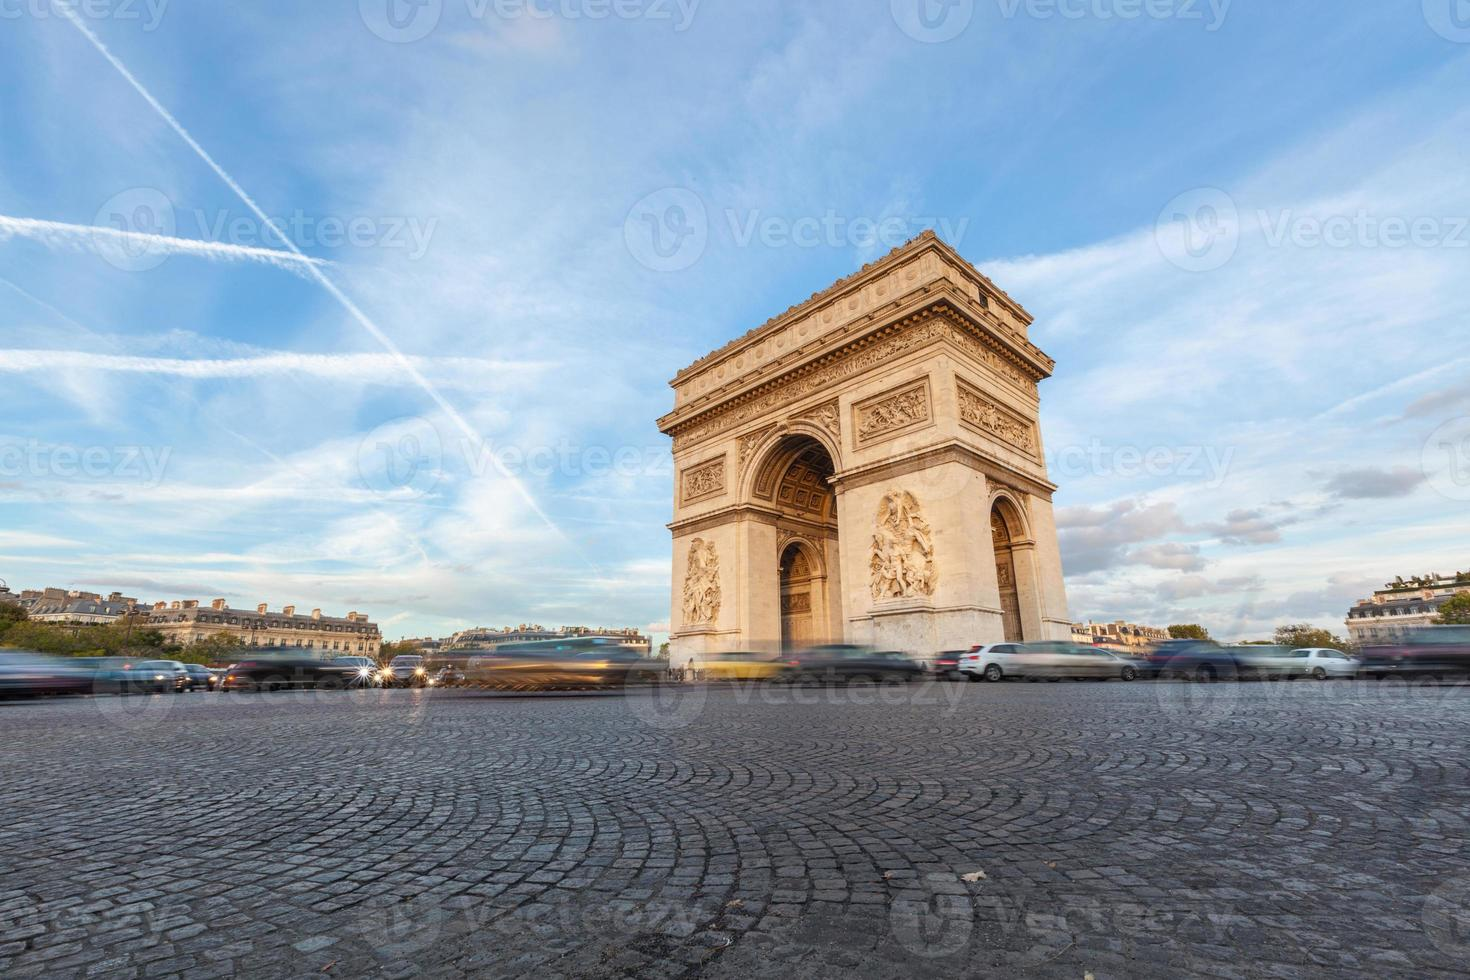 Arch de Triomphe in Paris photo